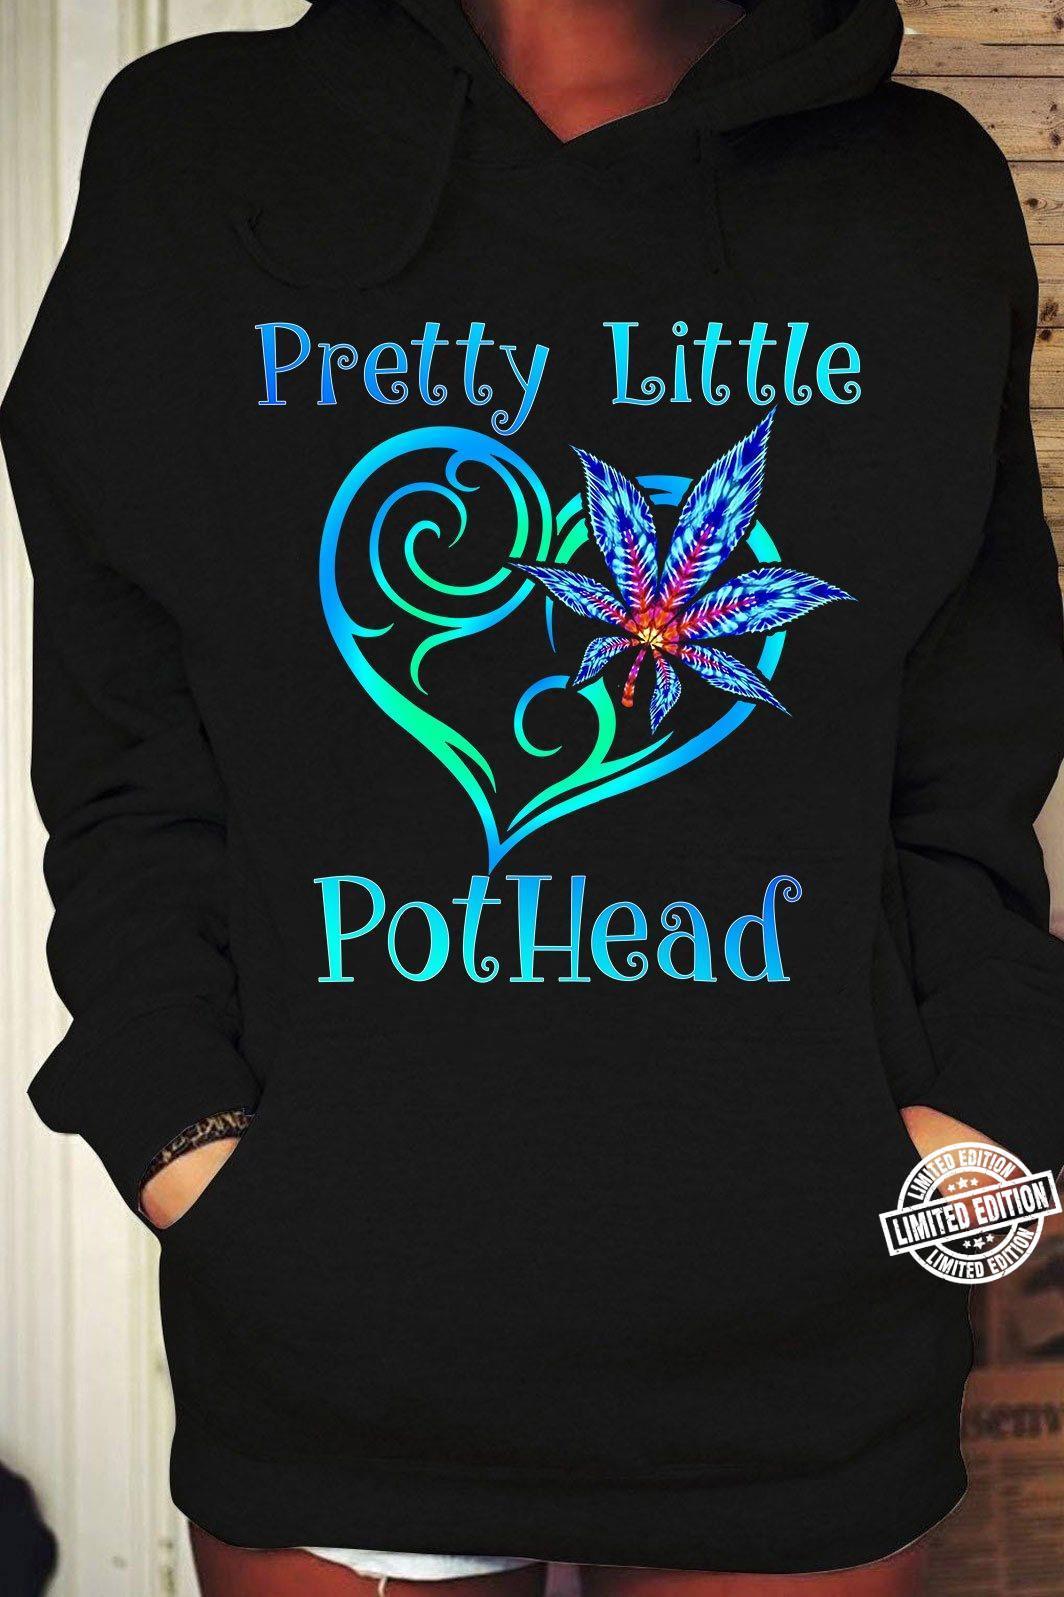 Pretty little pothead shirt